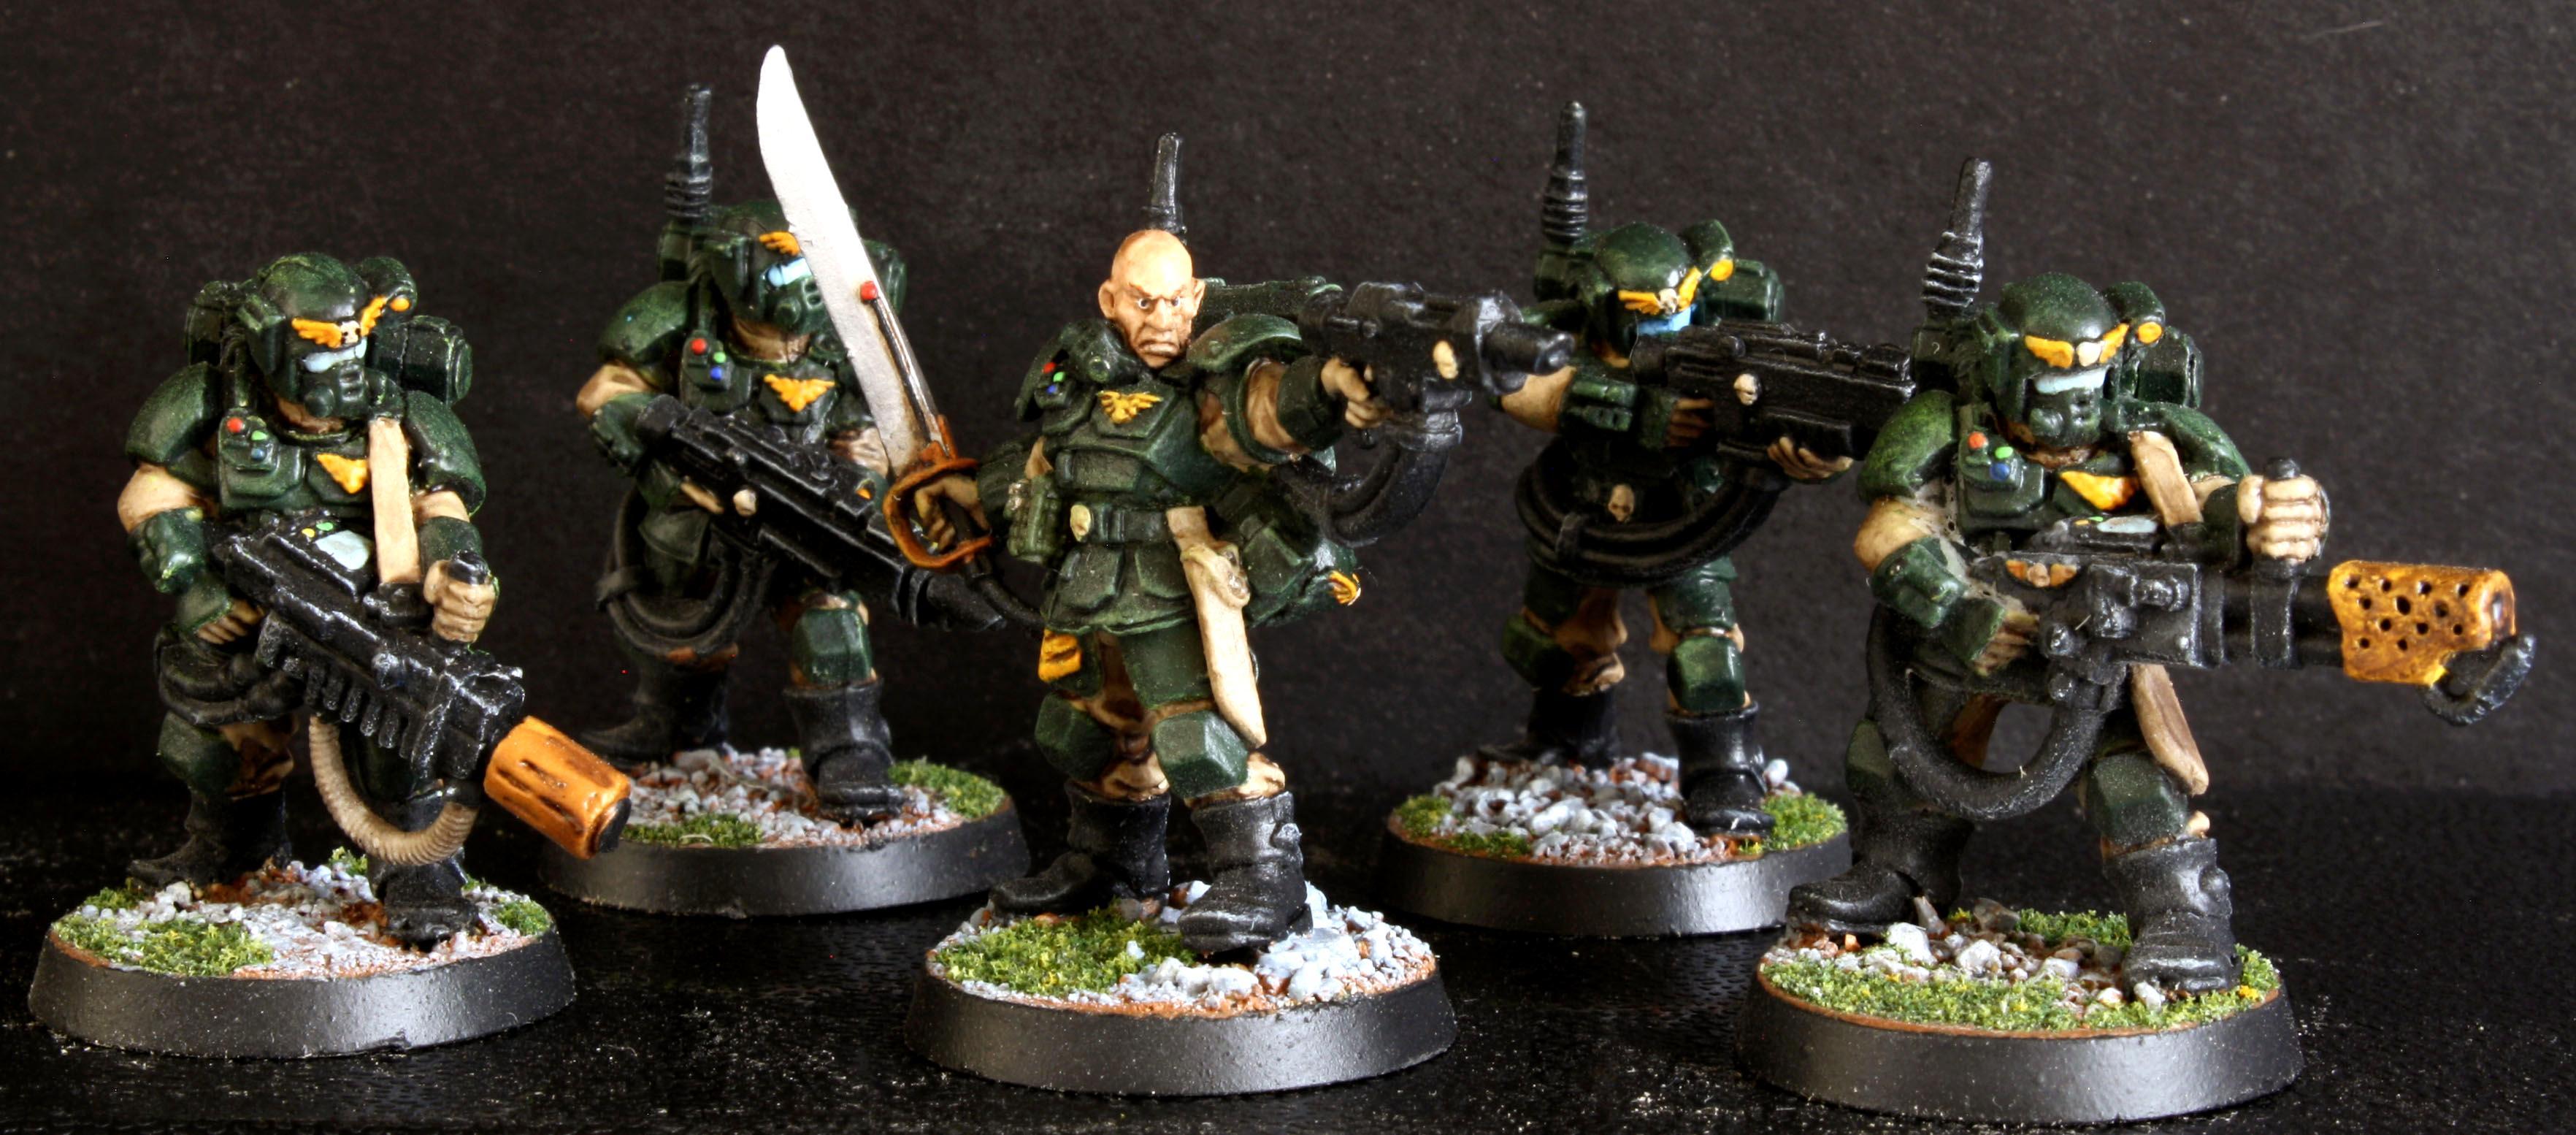 Astra Militarum, Imperial Guard, Kasrkin, Kasrkin Stormtroopers, Storm Troopers, Stormtrooper Squad